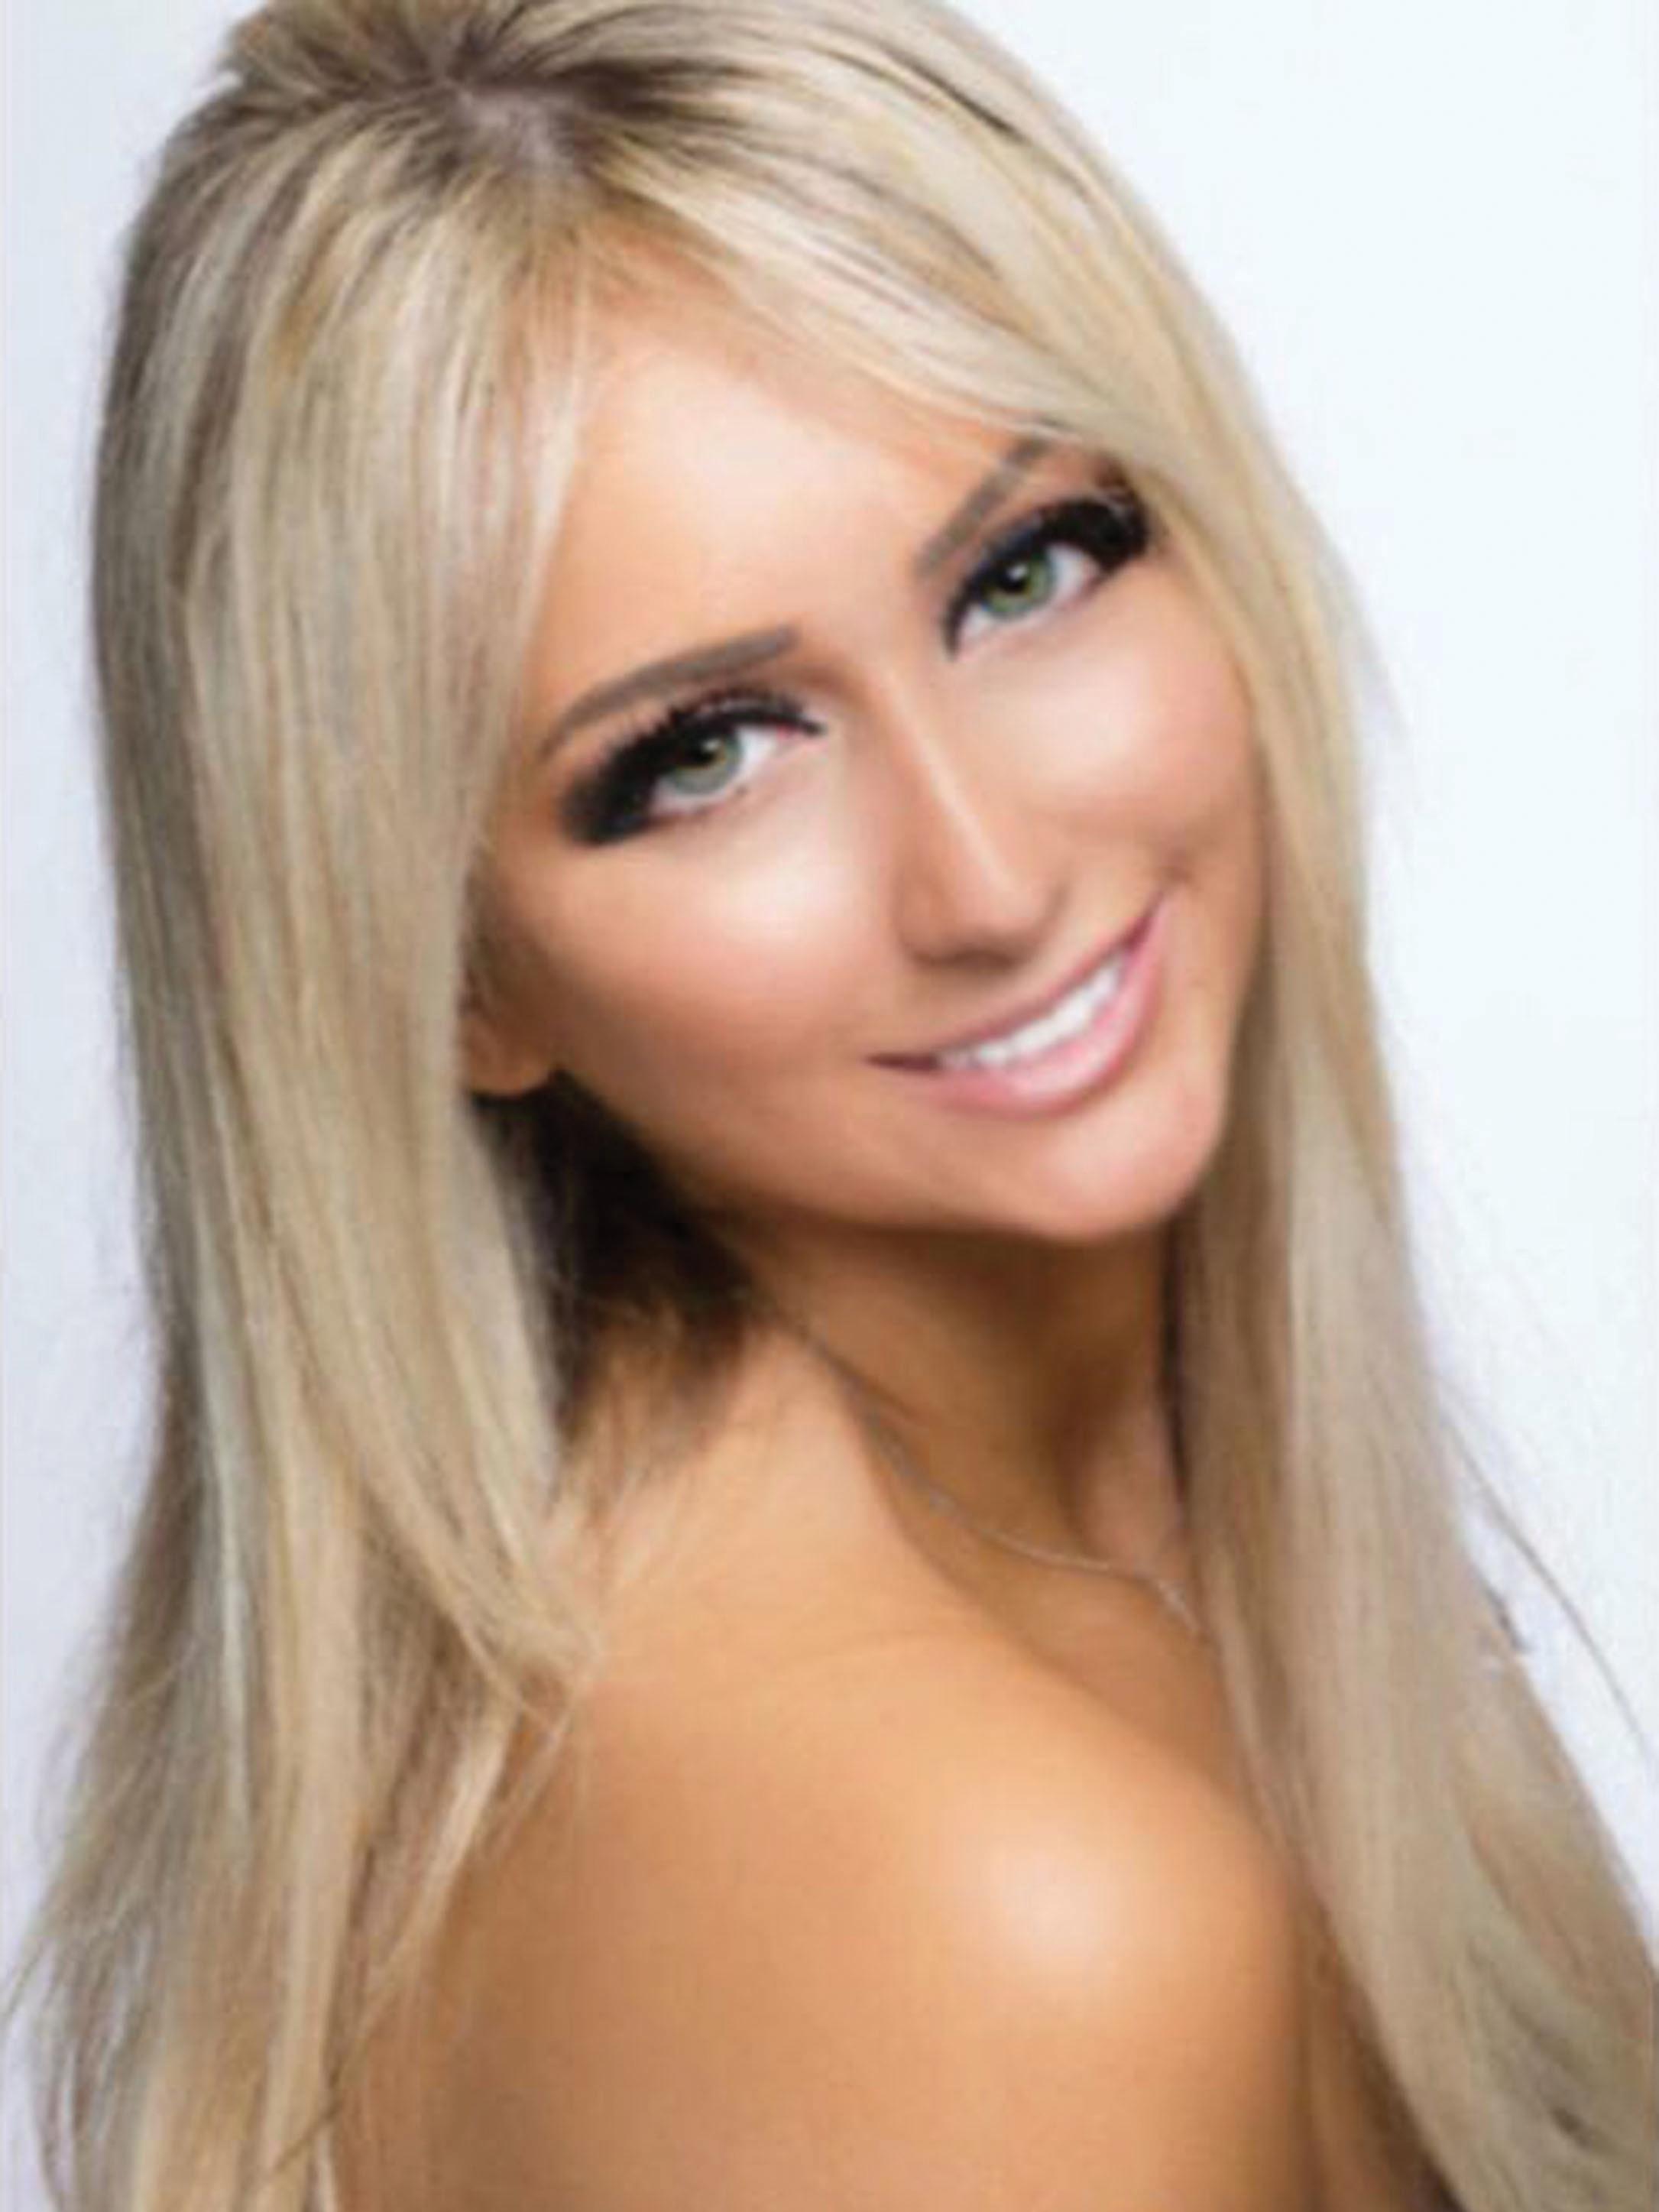 Samantha Marcolini